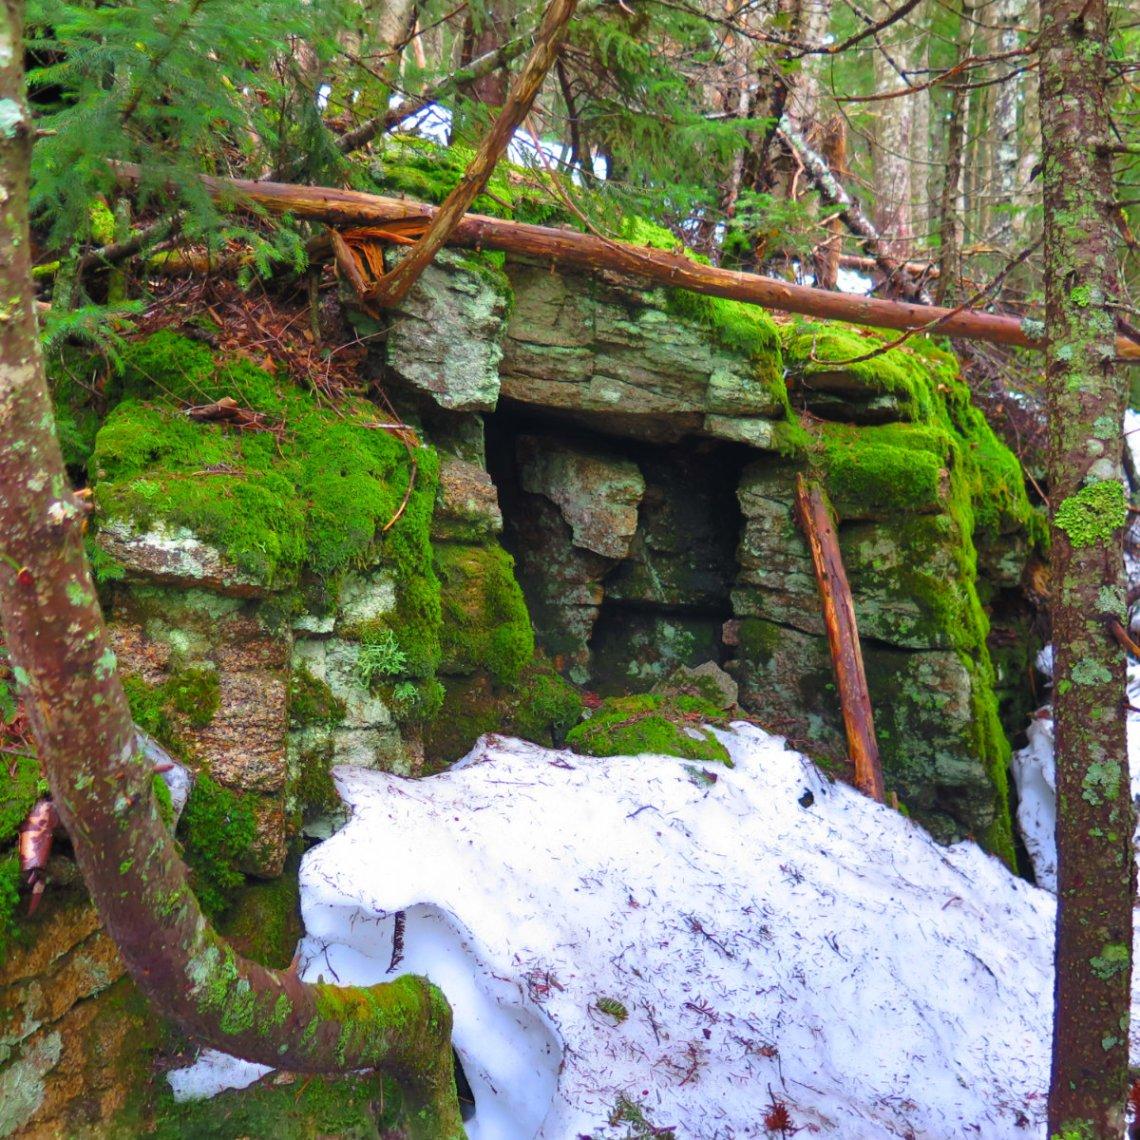 Whiteface-Passaconaway-Cleaved-Stones-20190424